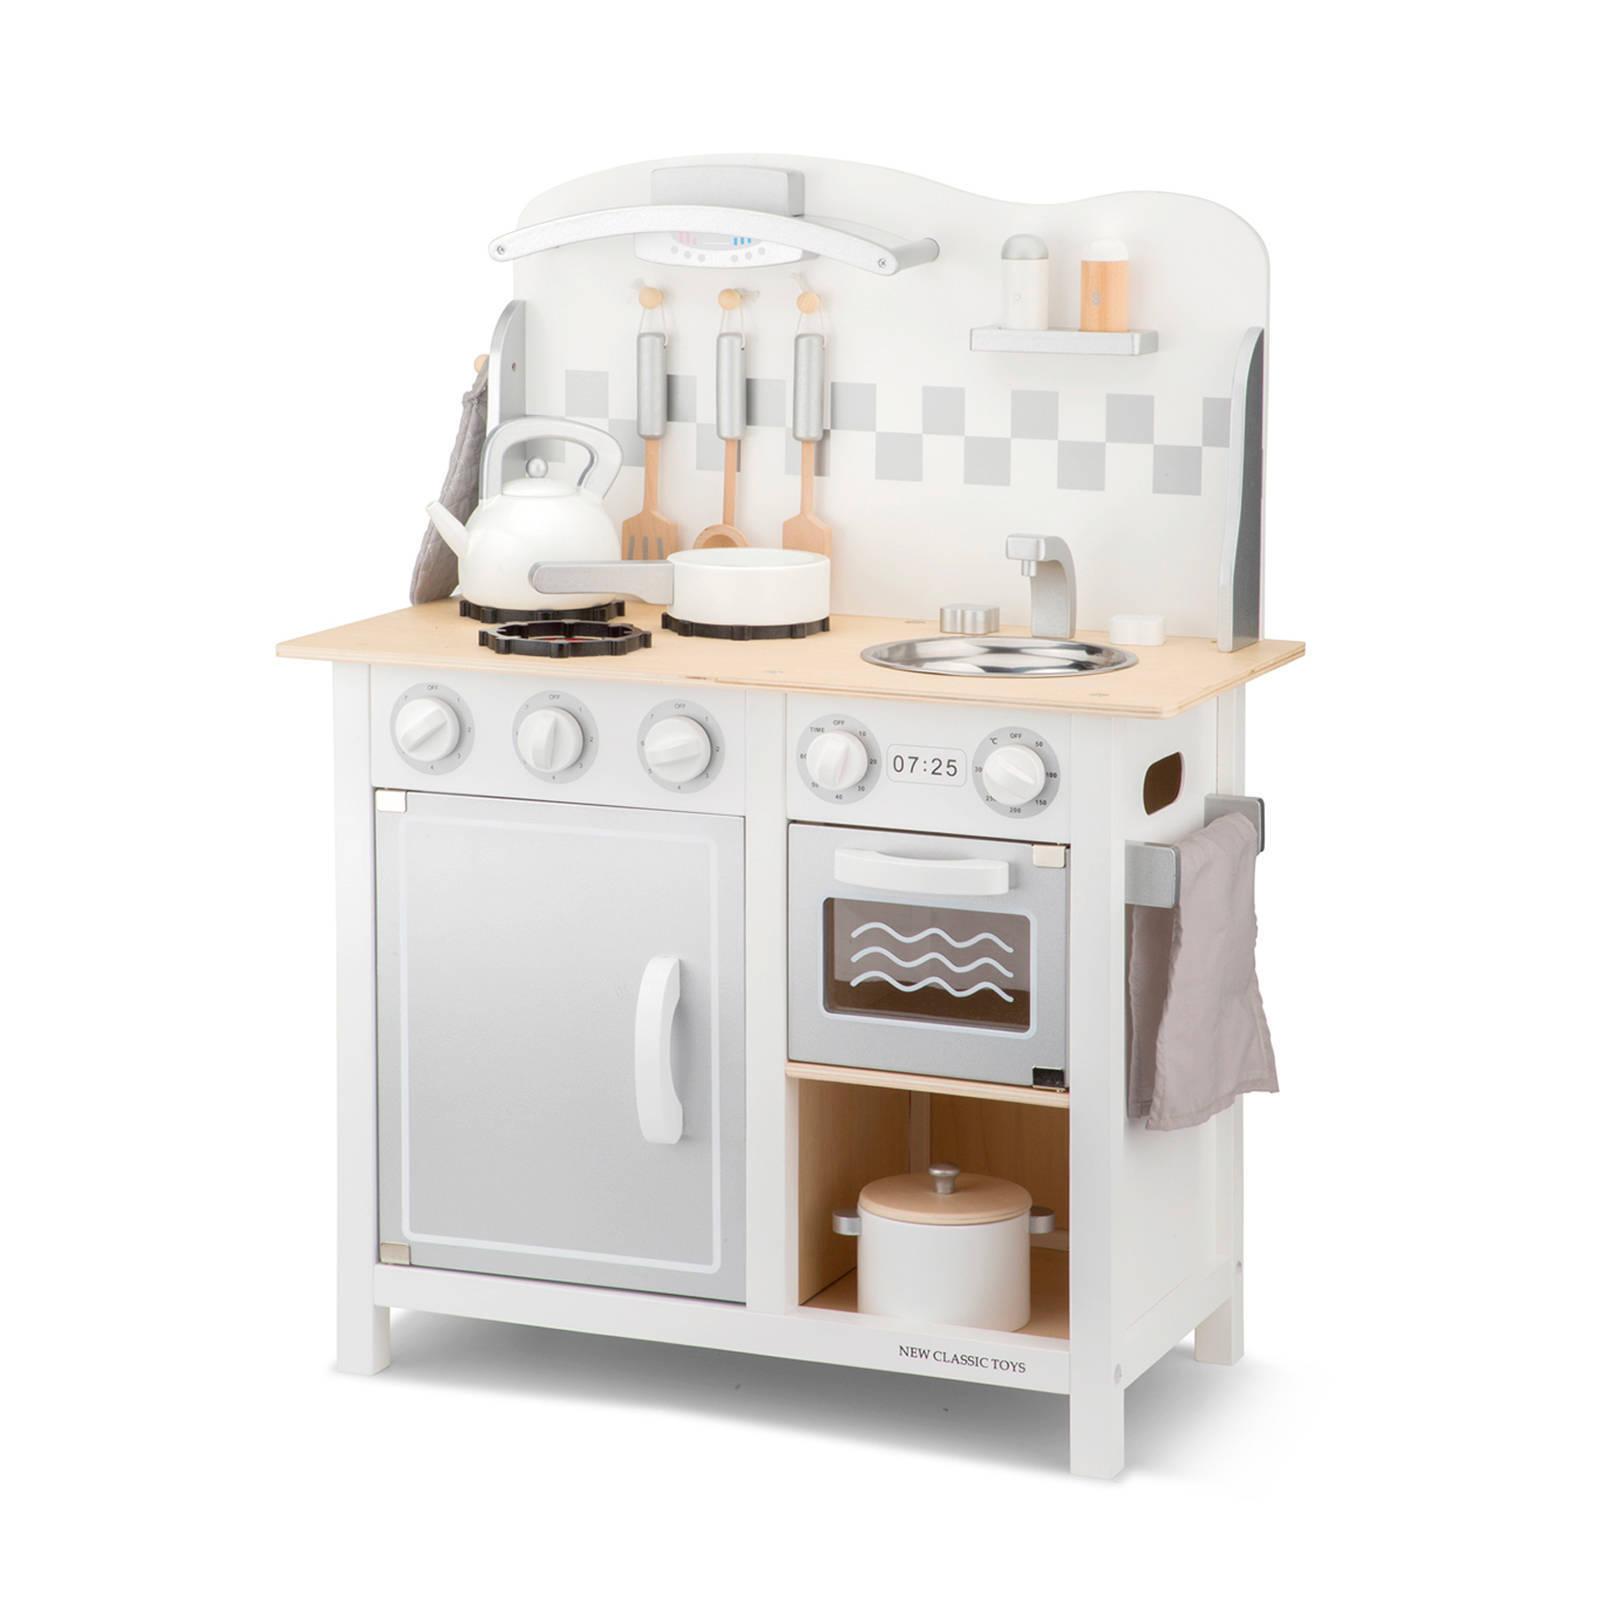 New Classic Toys houten Kinderkeuken Bon Appetit DeLuxe Wit/Zilver online kopen